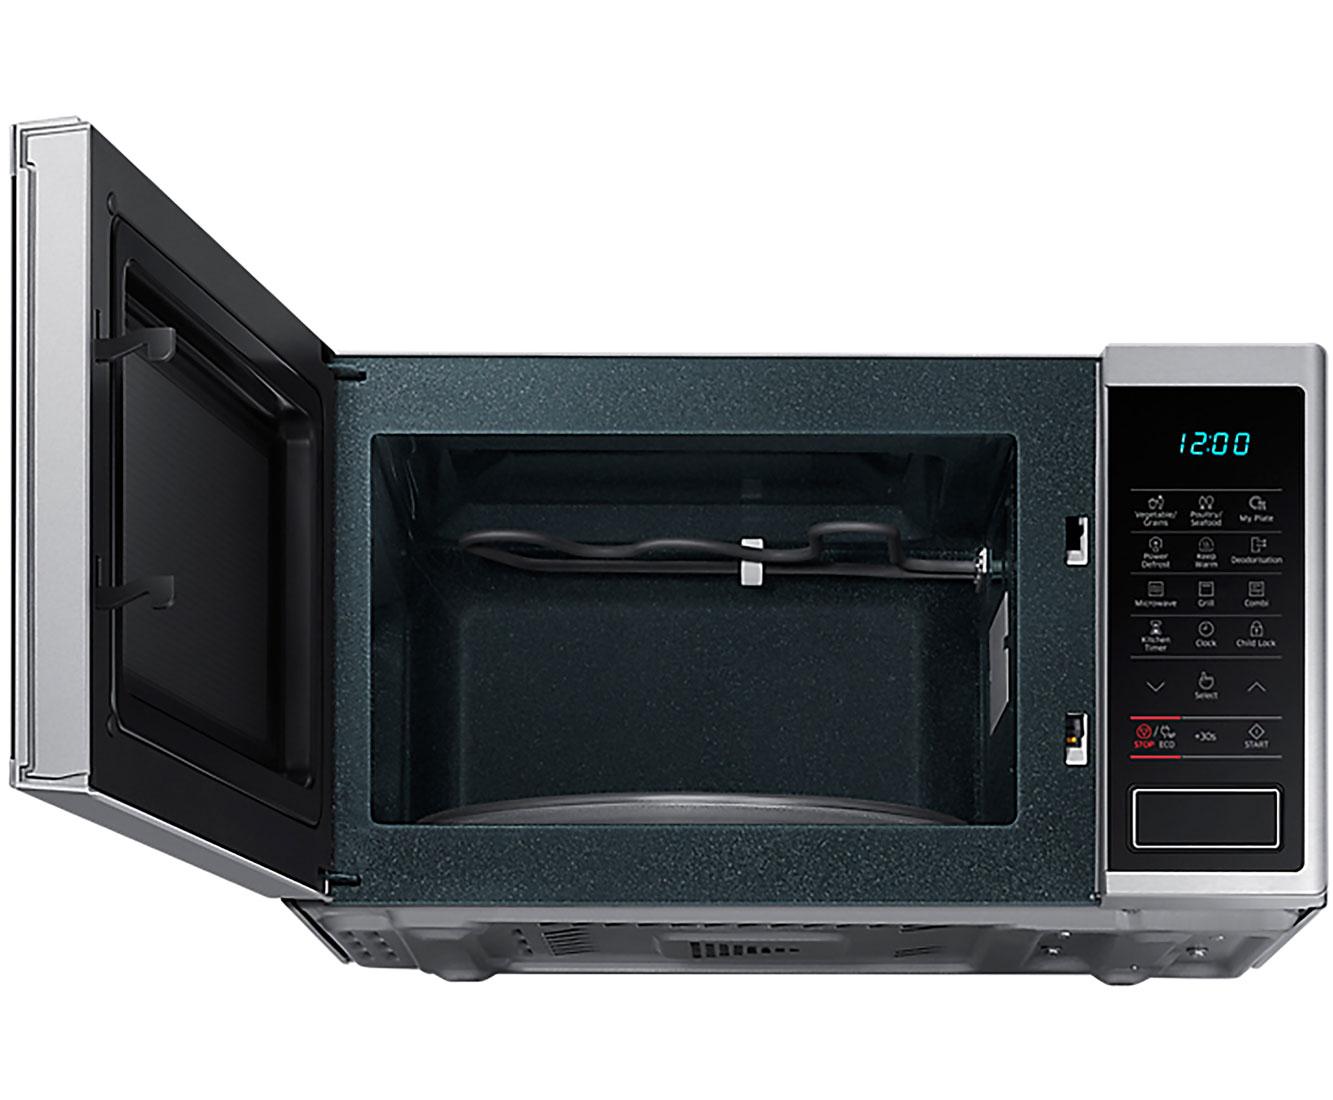 Samsung MG23J5133AT/EG